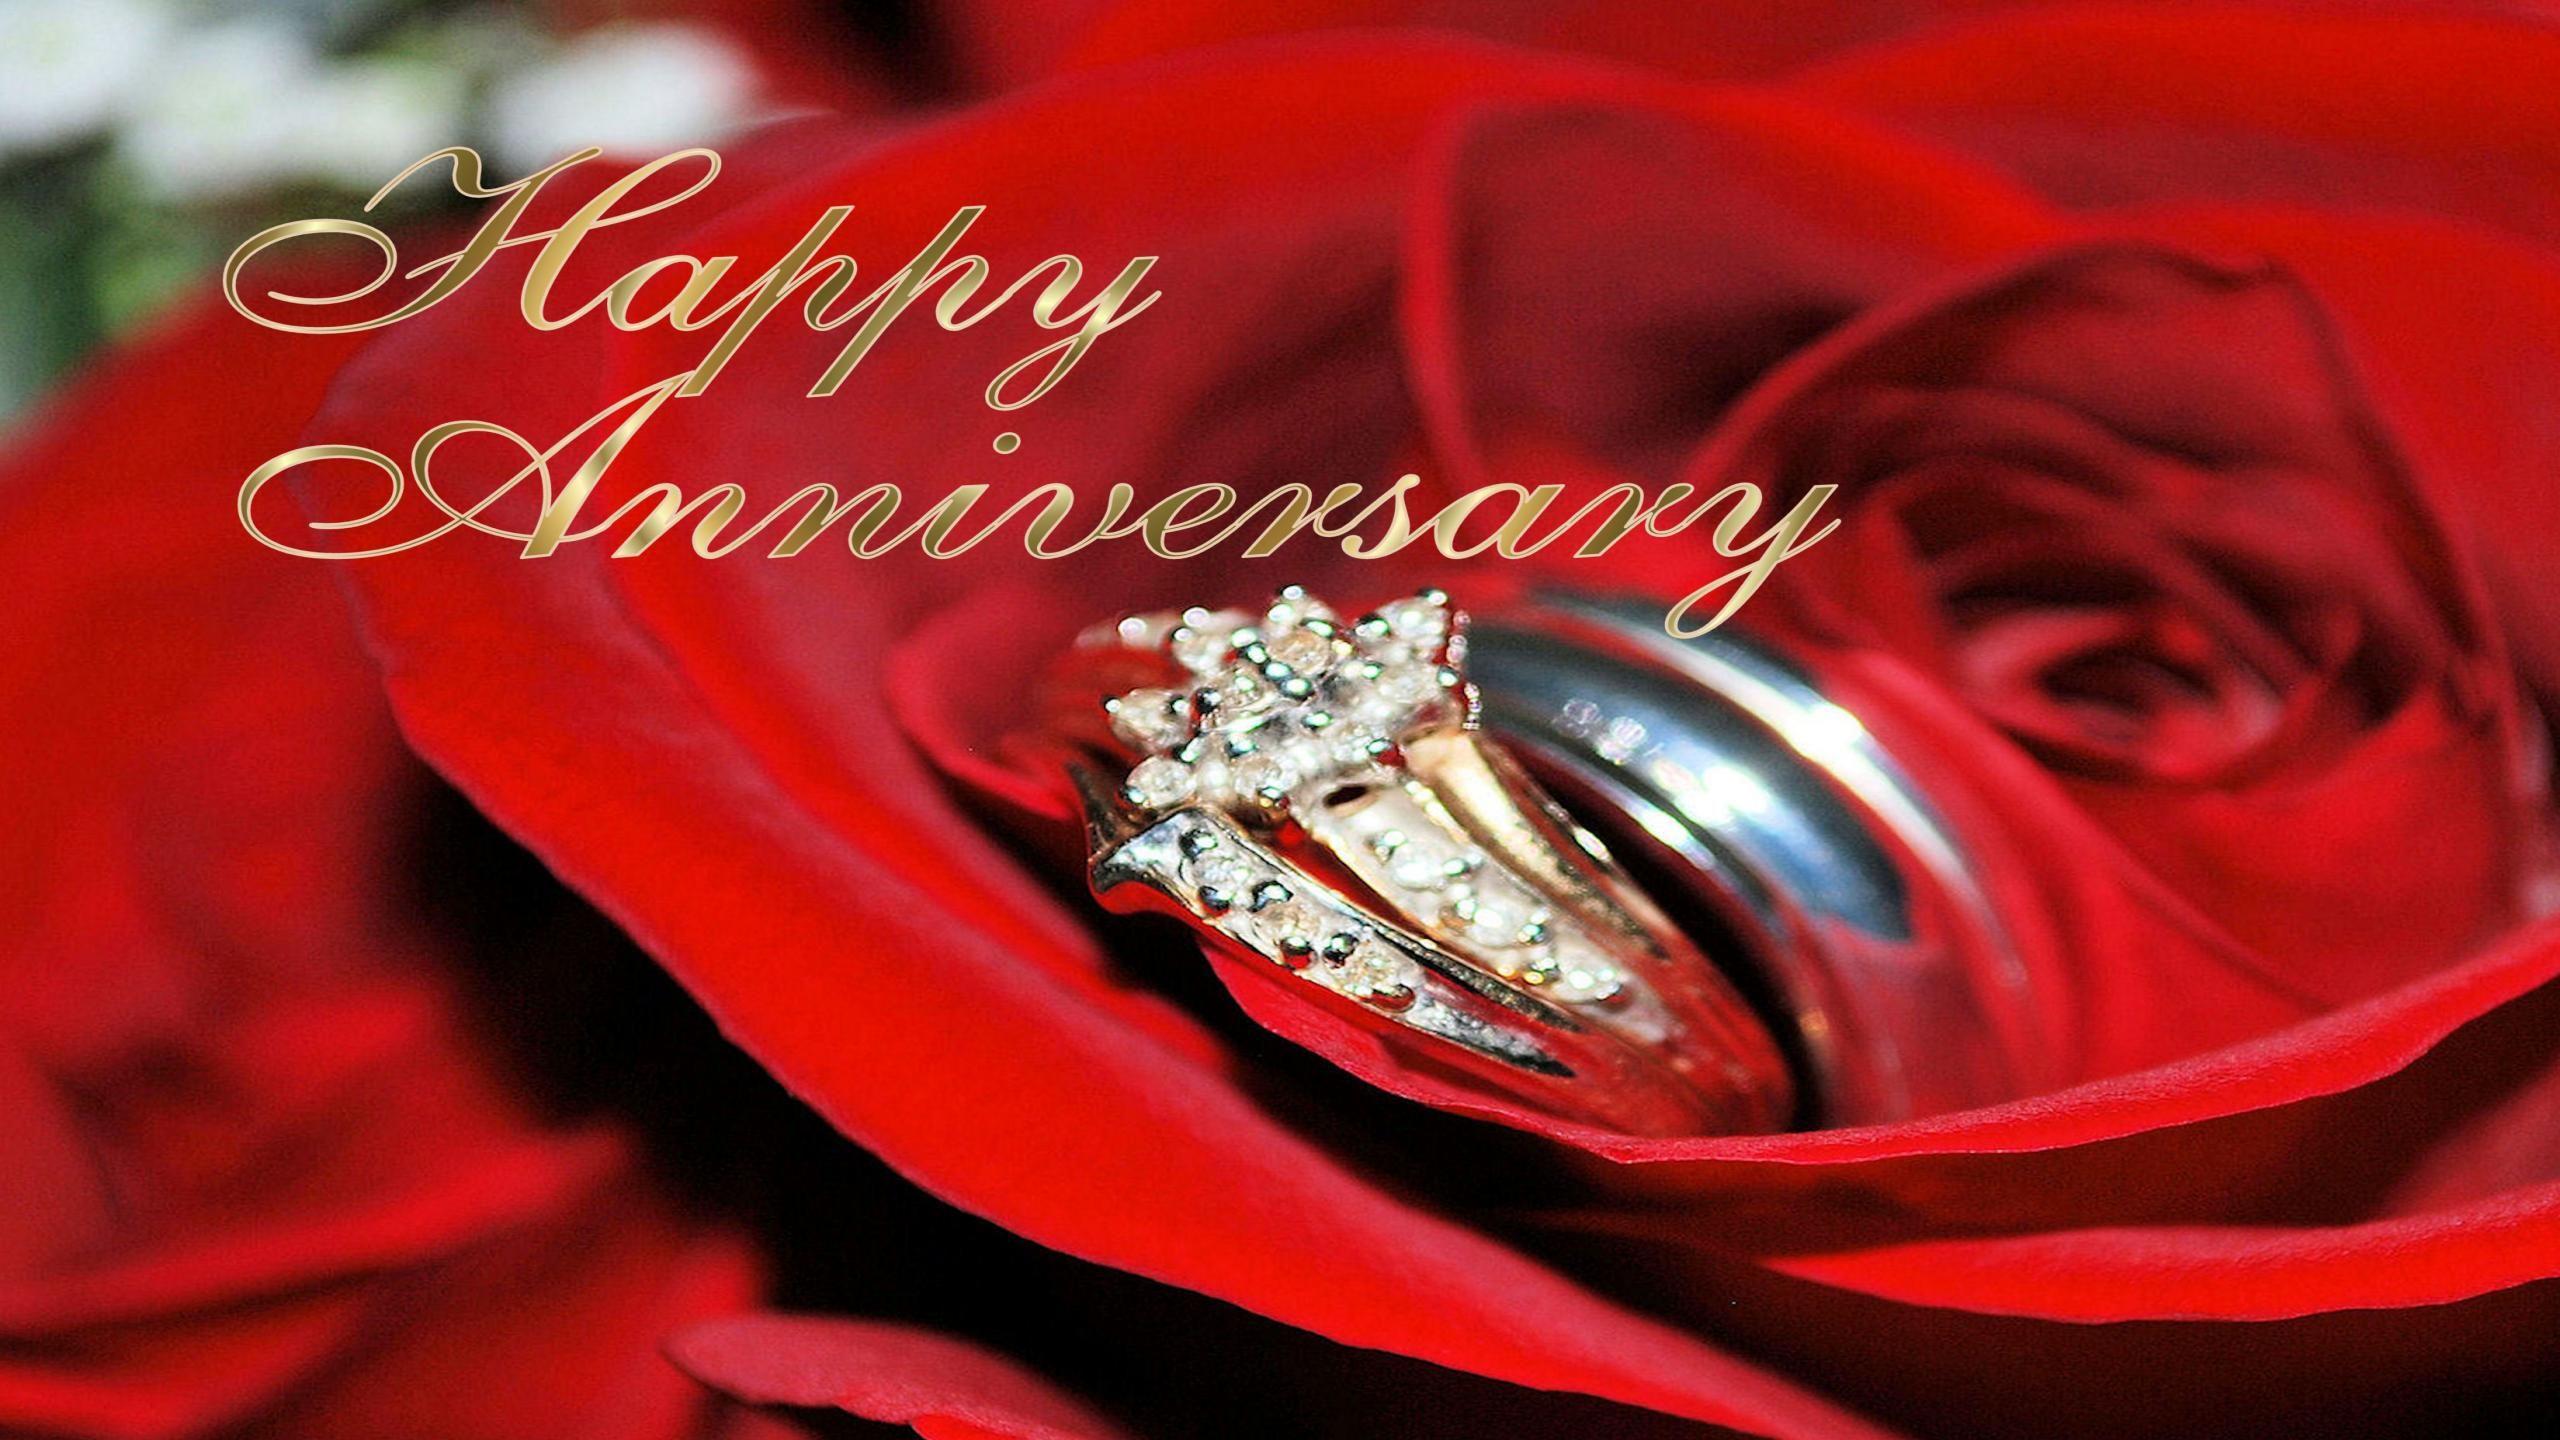 Wedding anniversary greetings for wife husband or couple happy wedding anniversary greetings for wife husband or couple kristyandbryce Choice Image